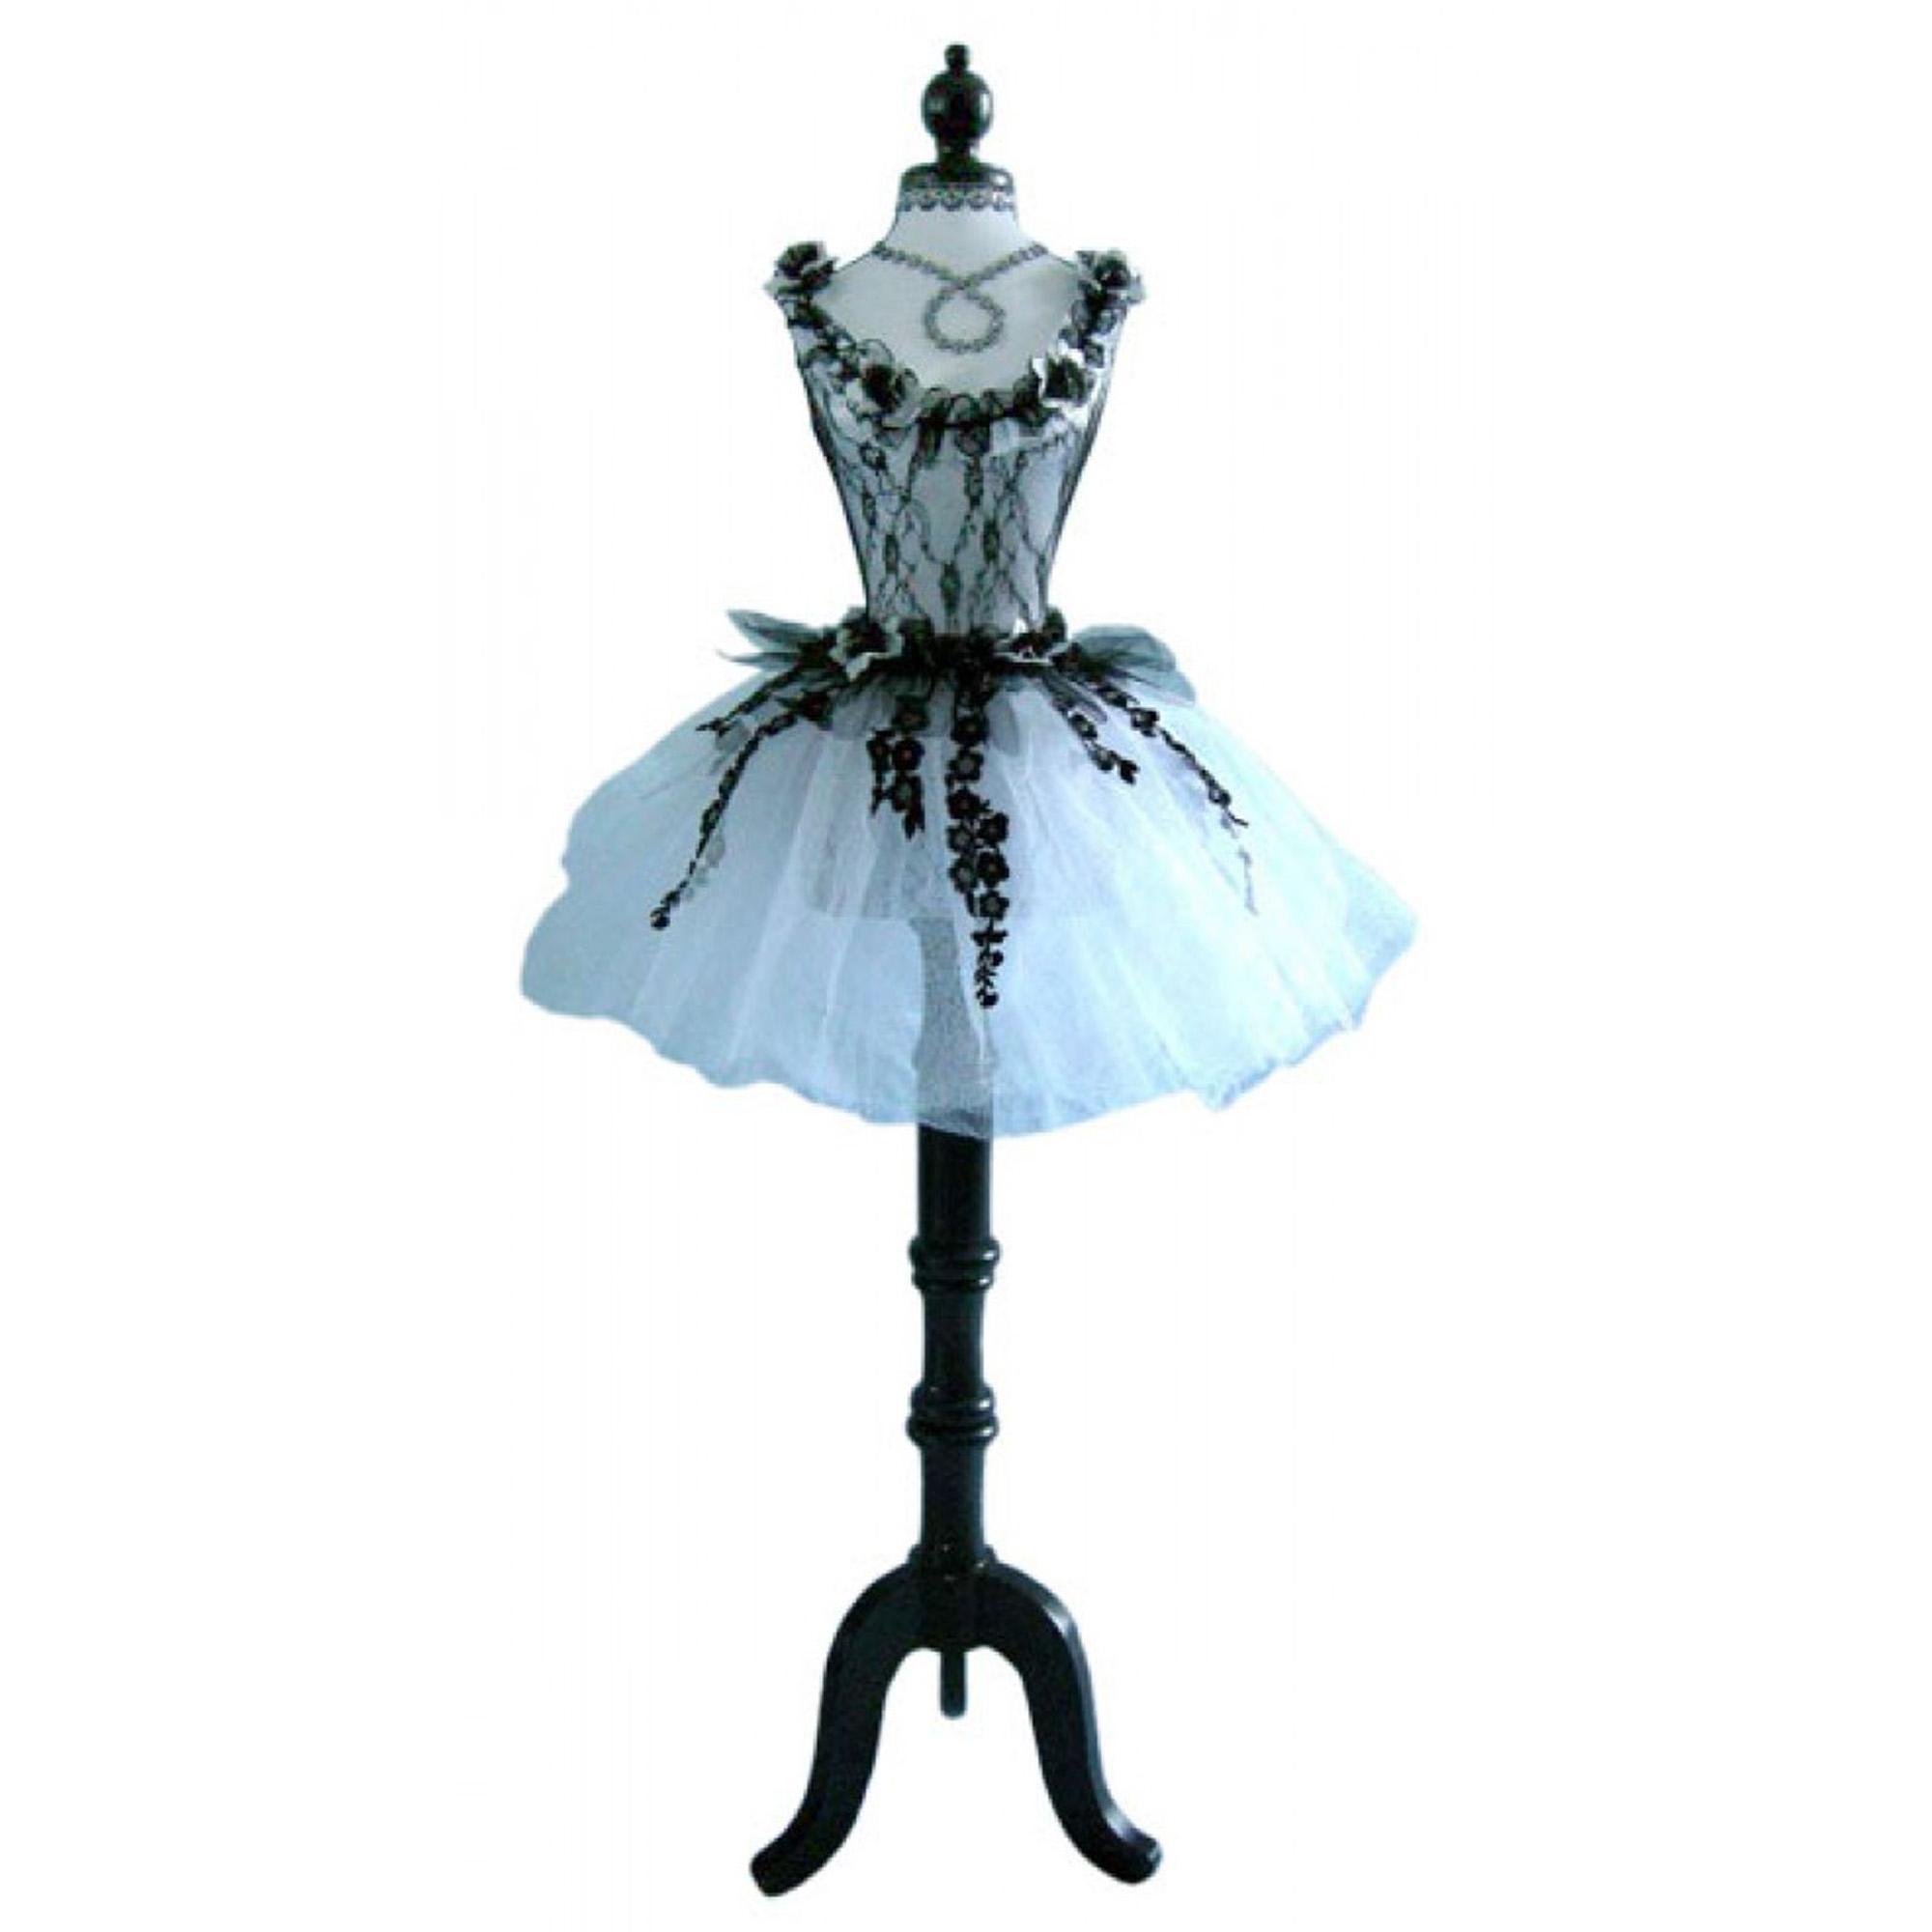 White Amp Black Dressed Mannequin Mannequins